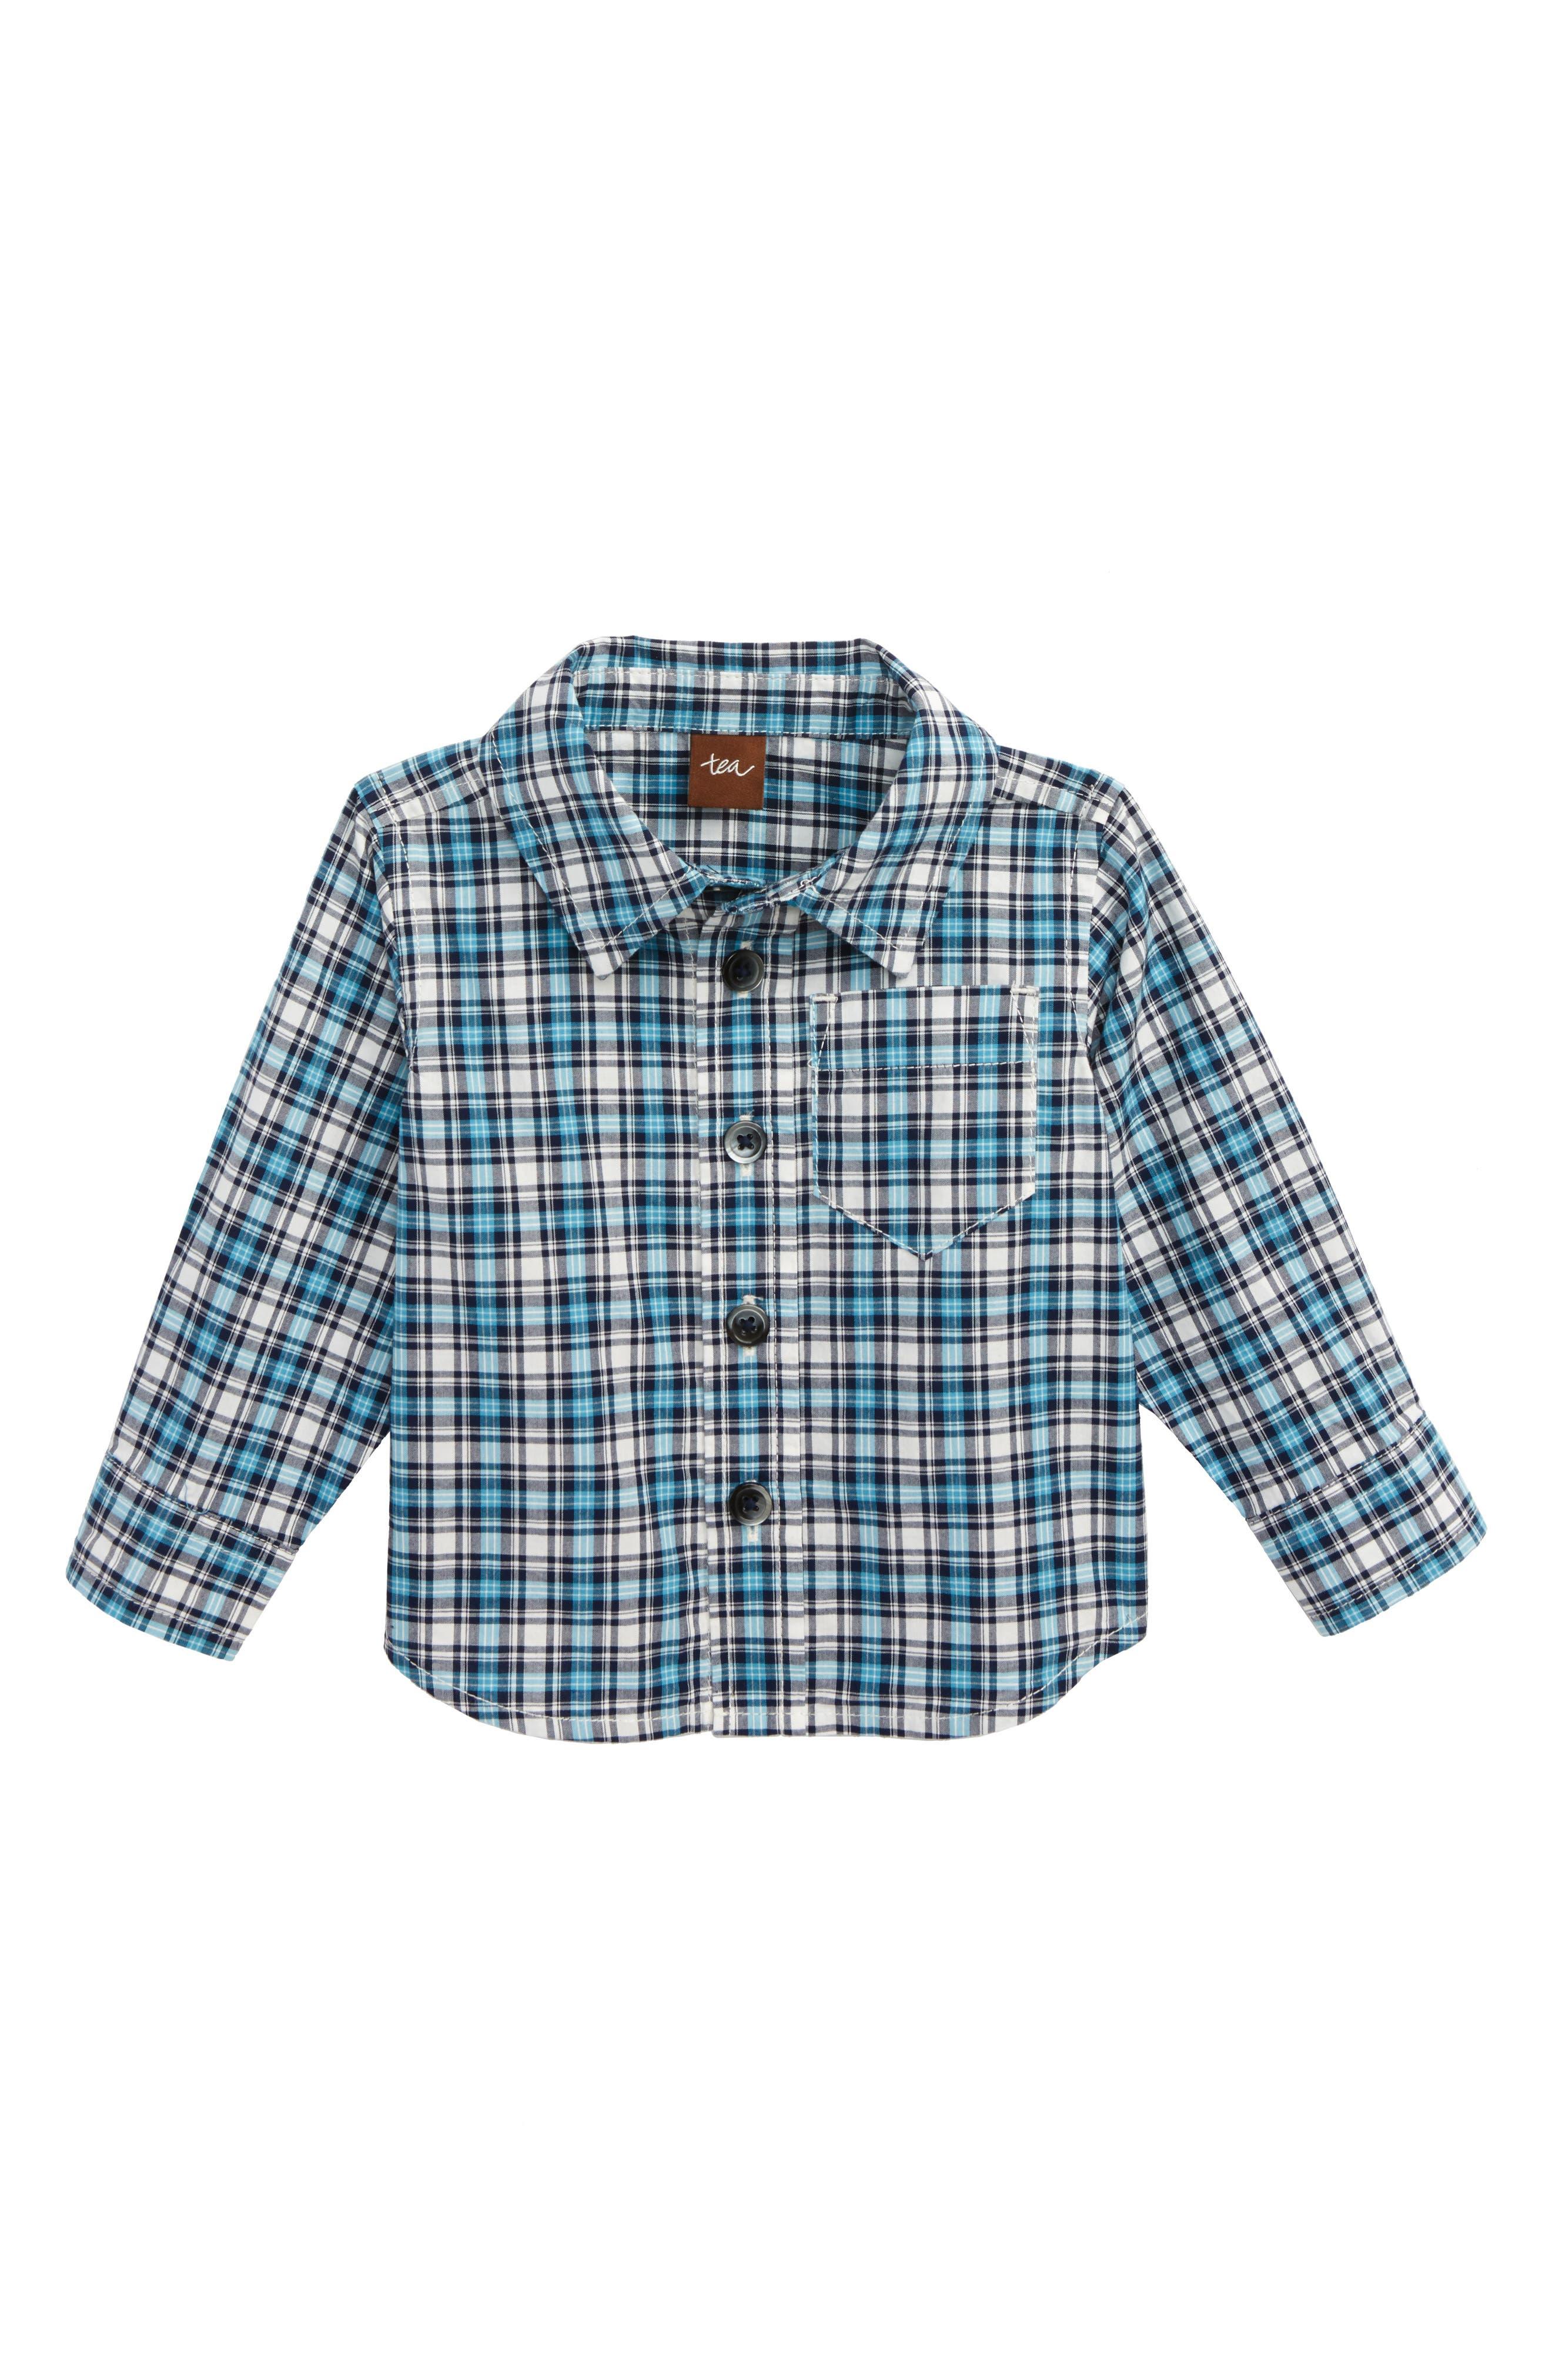 Heath Plaid Woven Shirt,                         Main,                         color, 400